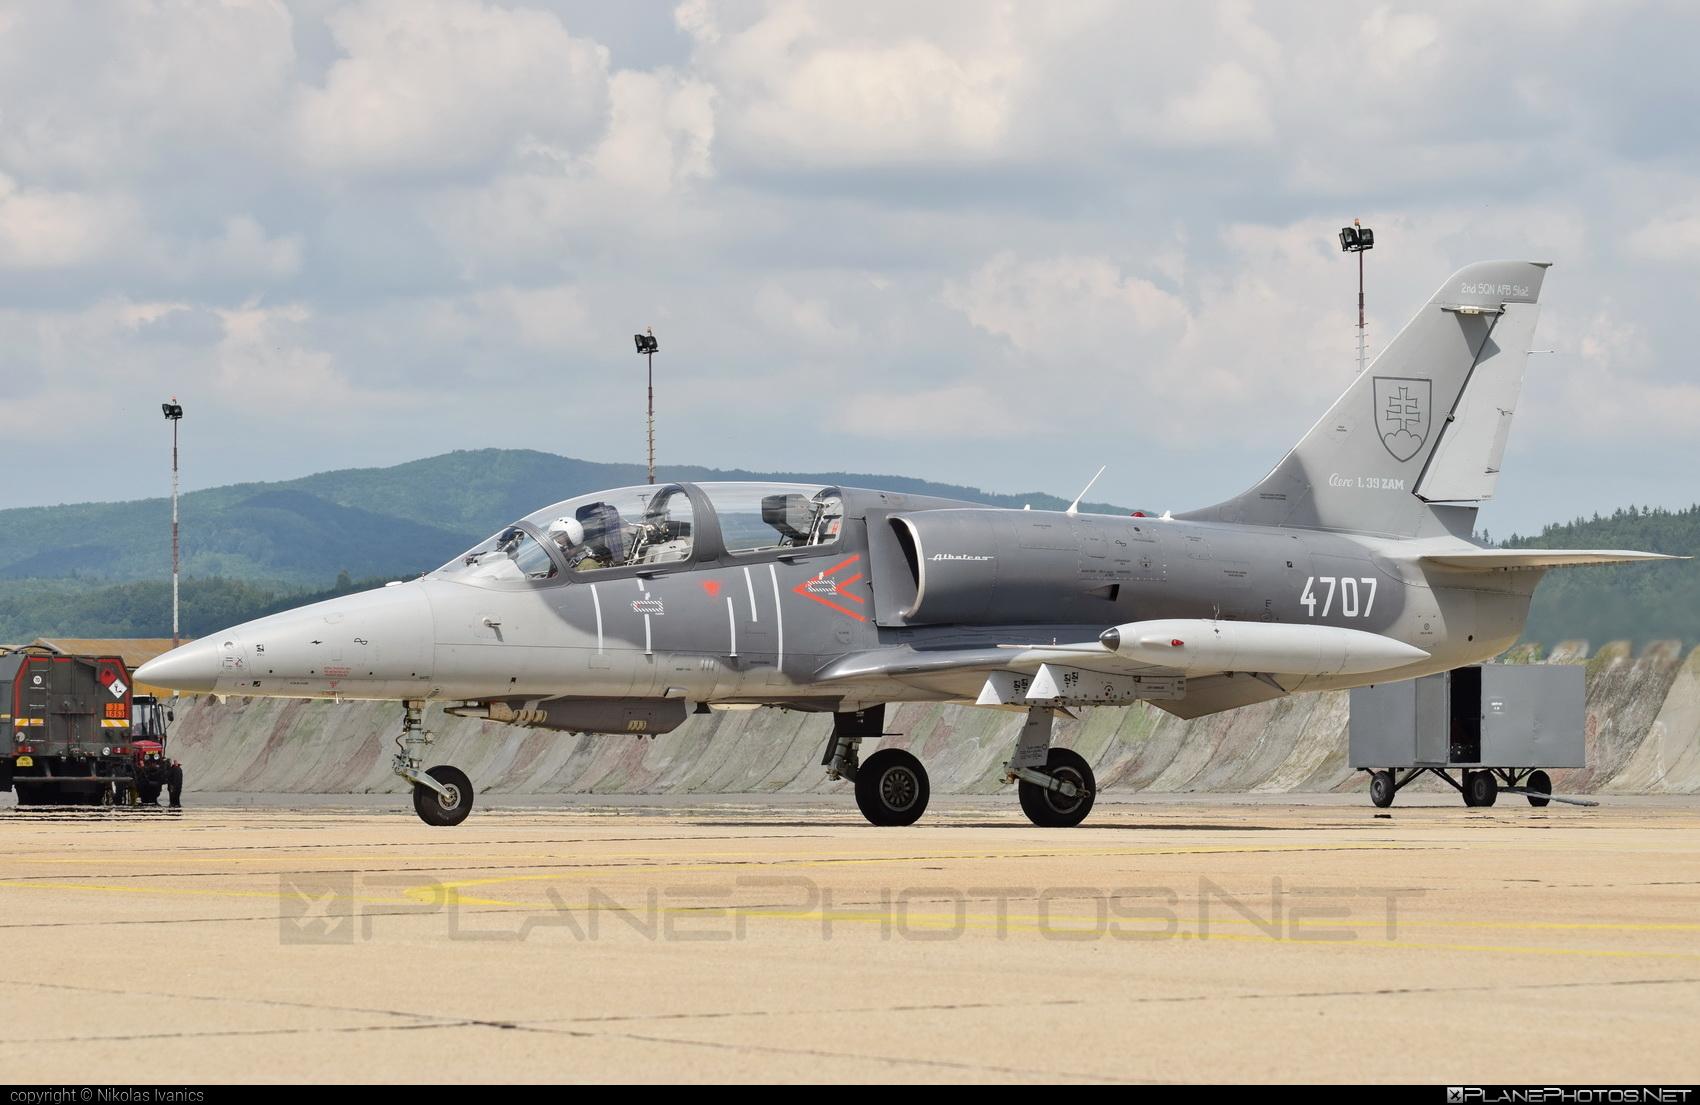 Aero L-39ZAM Albatros - 4707 operated by Vzdušné sily OS SR (Slovak Air Force) #aero #aerol39 #aerol39albatros #aerol39zamalbatros #albatros #l39 #l39zam #l39zamalbatros #slovakairforce #vzdusnesilyossr